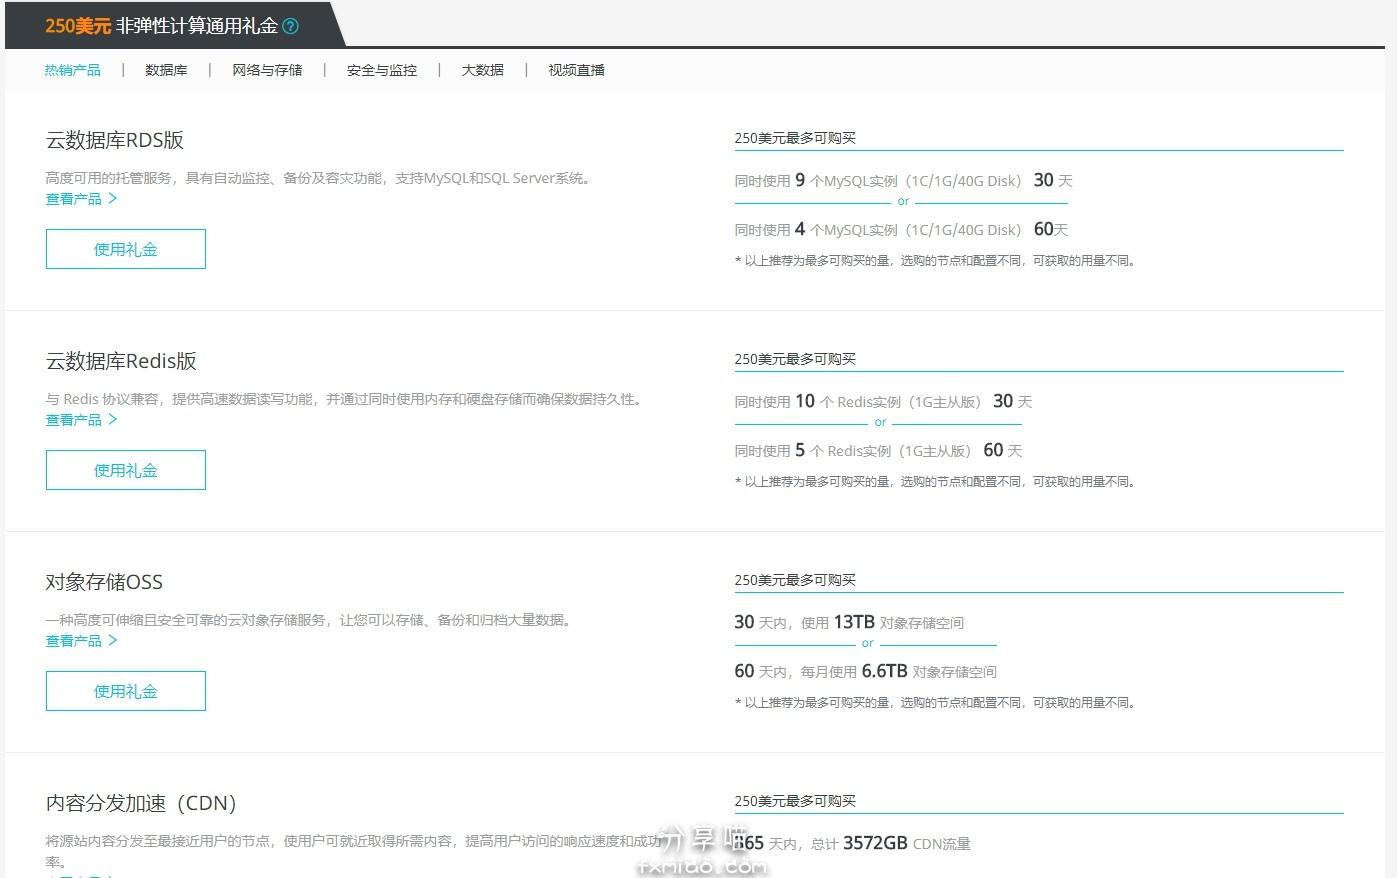 Snipaste 2018 02 03 15 05 05 - 用香港手机号注册阿里云国际版,获取300美金注册金